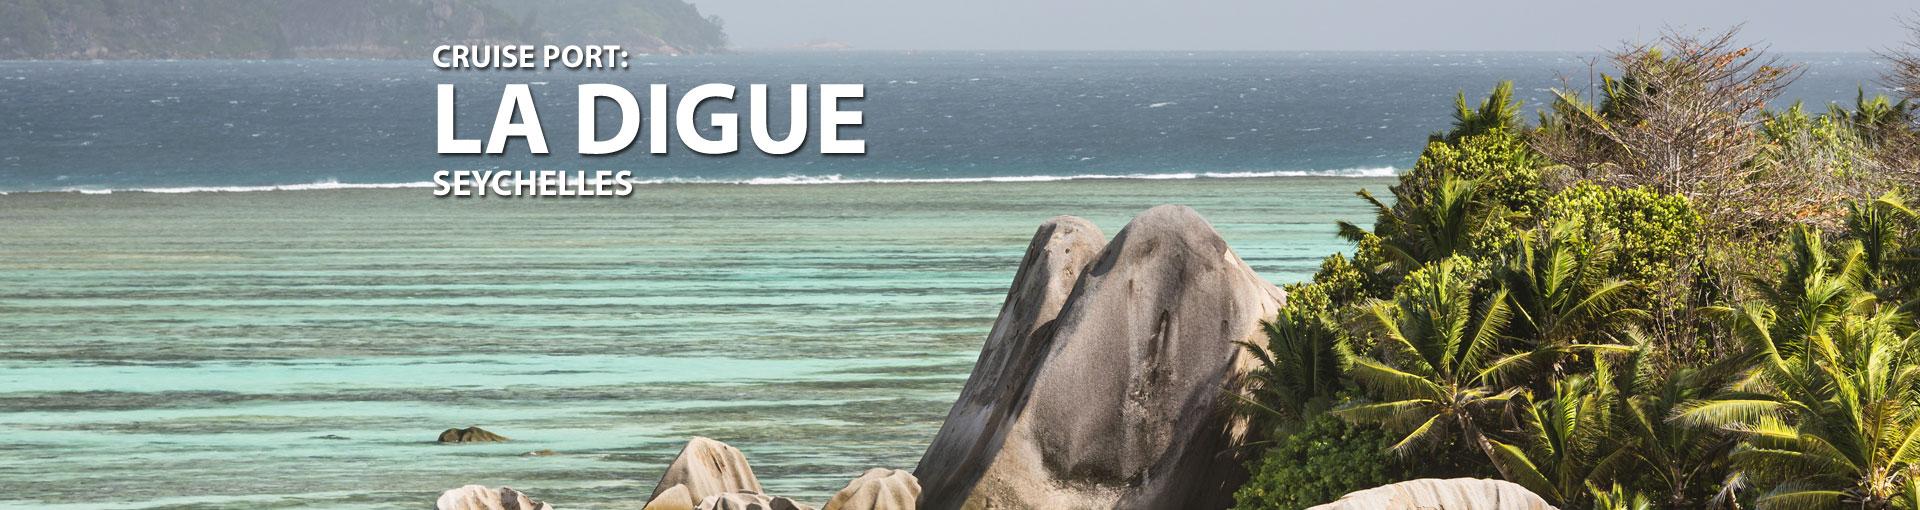 Cruises to La Digue, Seychelles